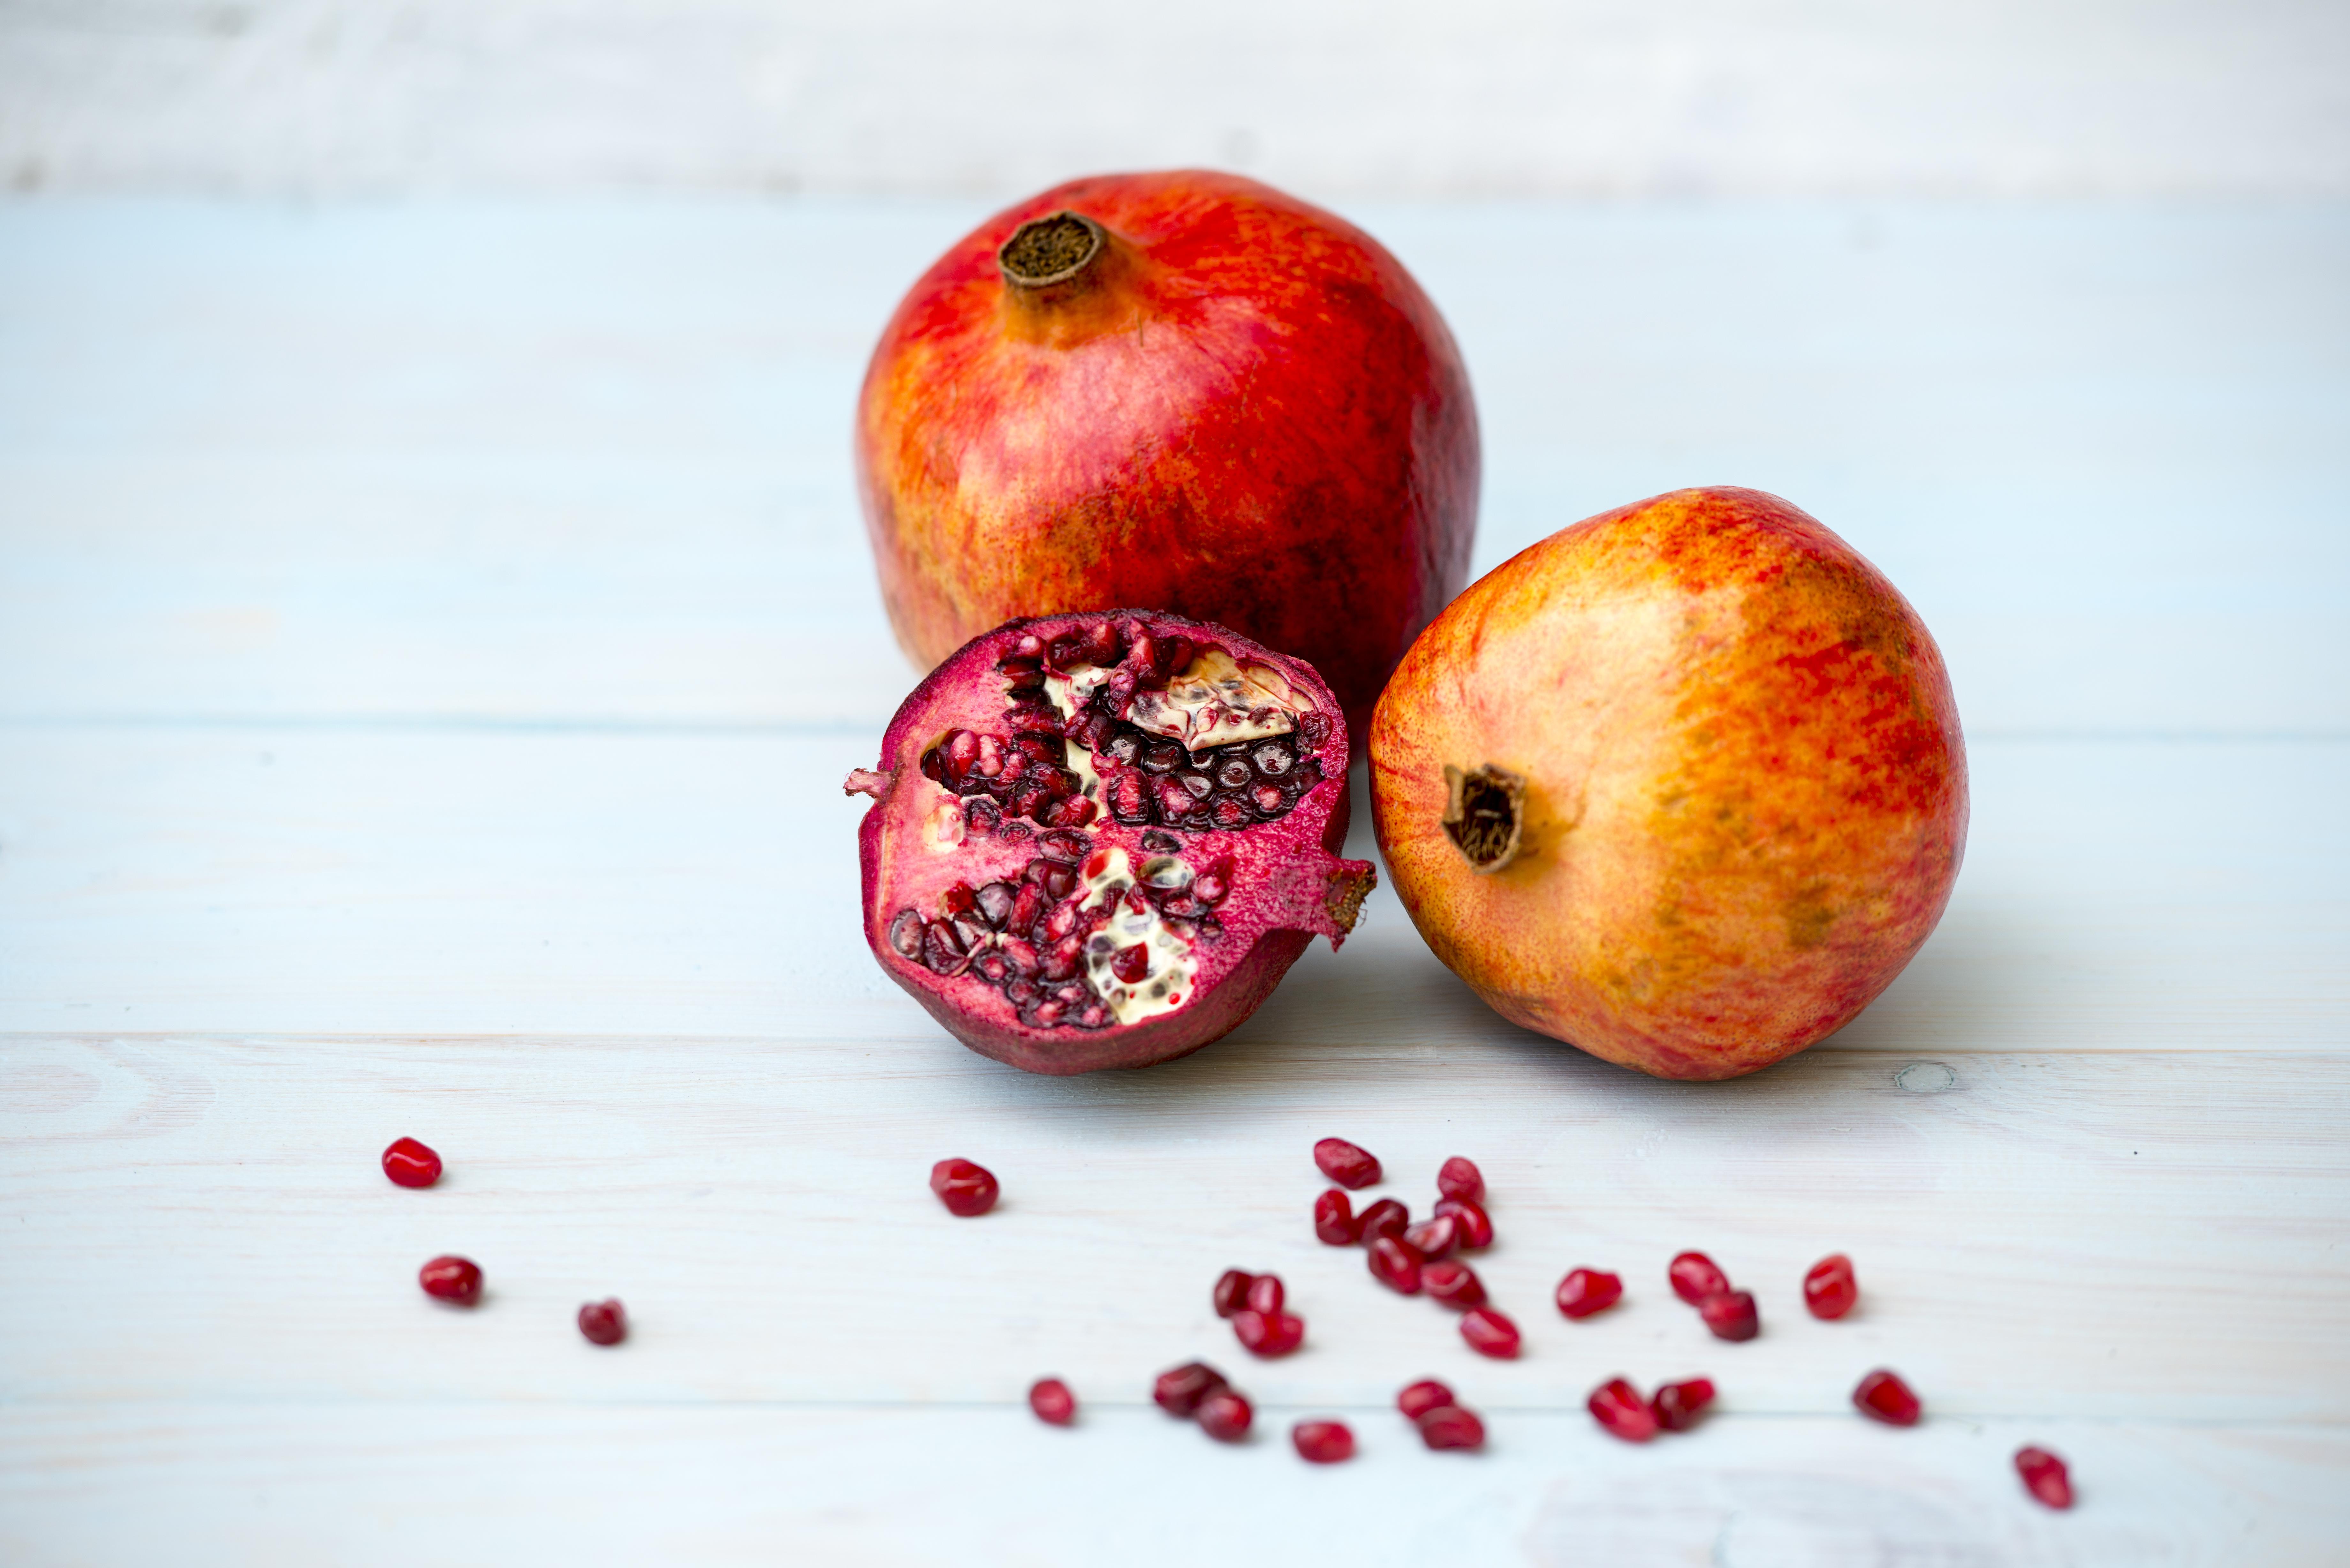 essay on pomegranate fruit